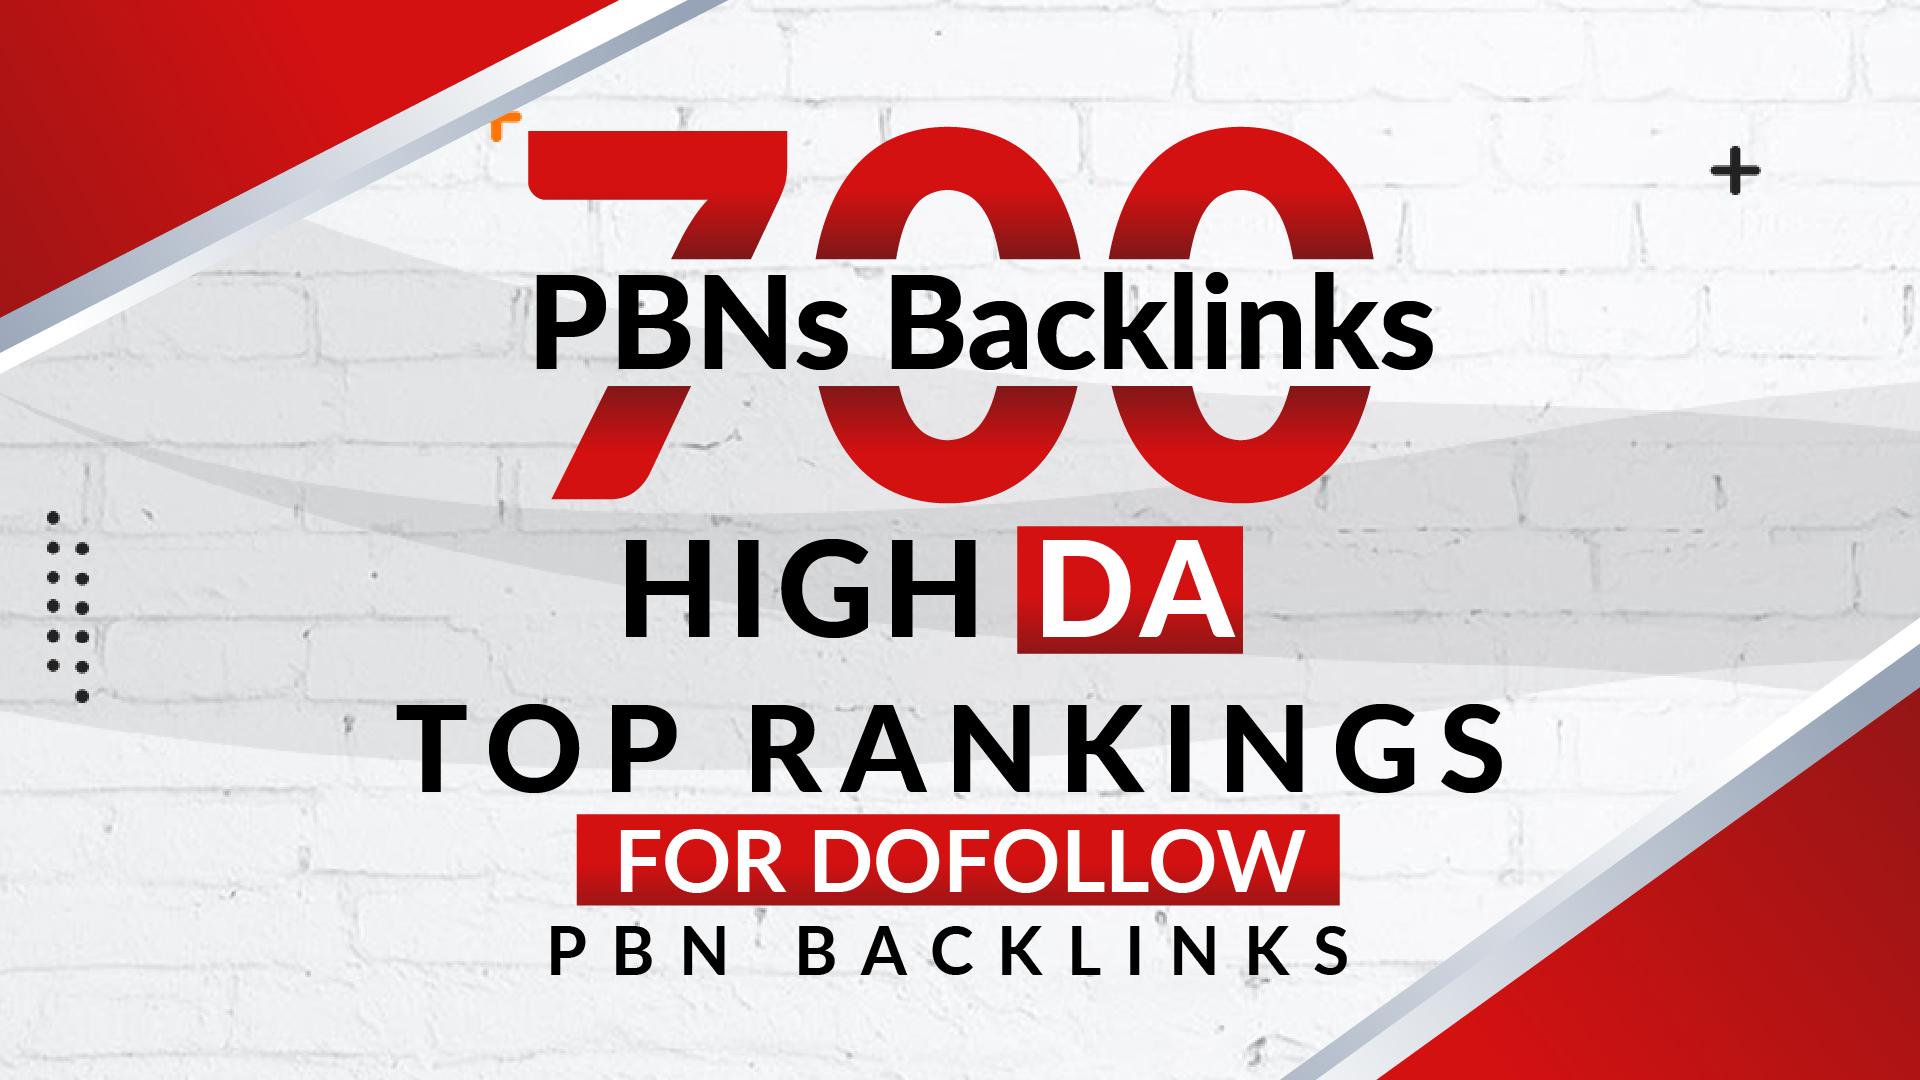 700 PBNs Backlinks High DA Top Rankings For Dofollow PBN Backlinks